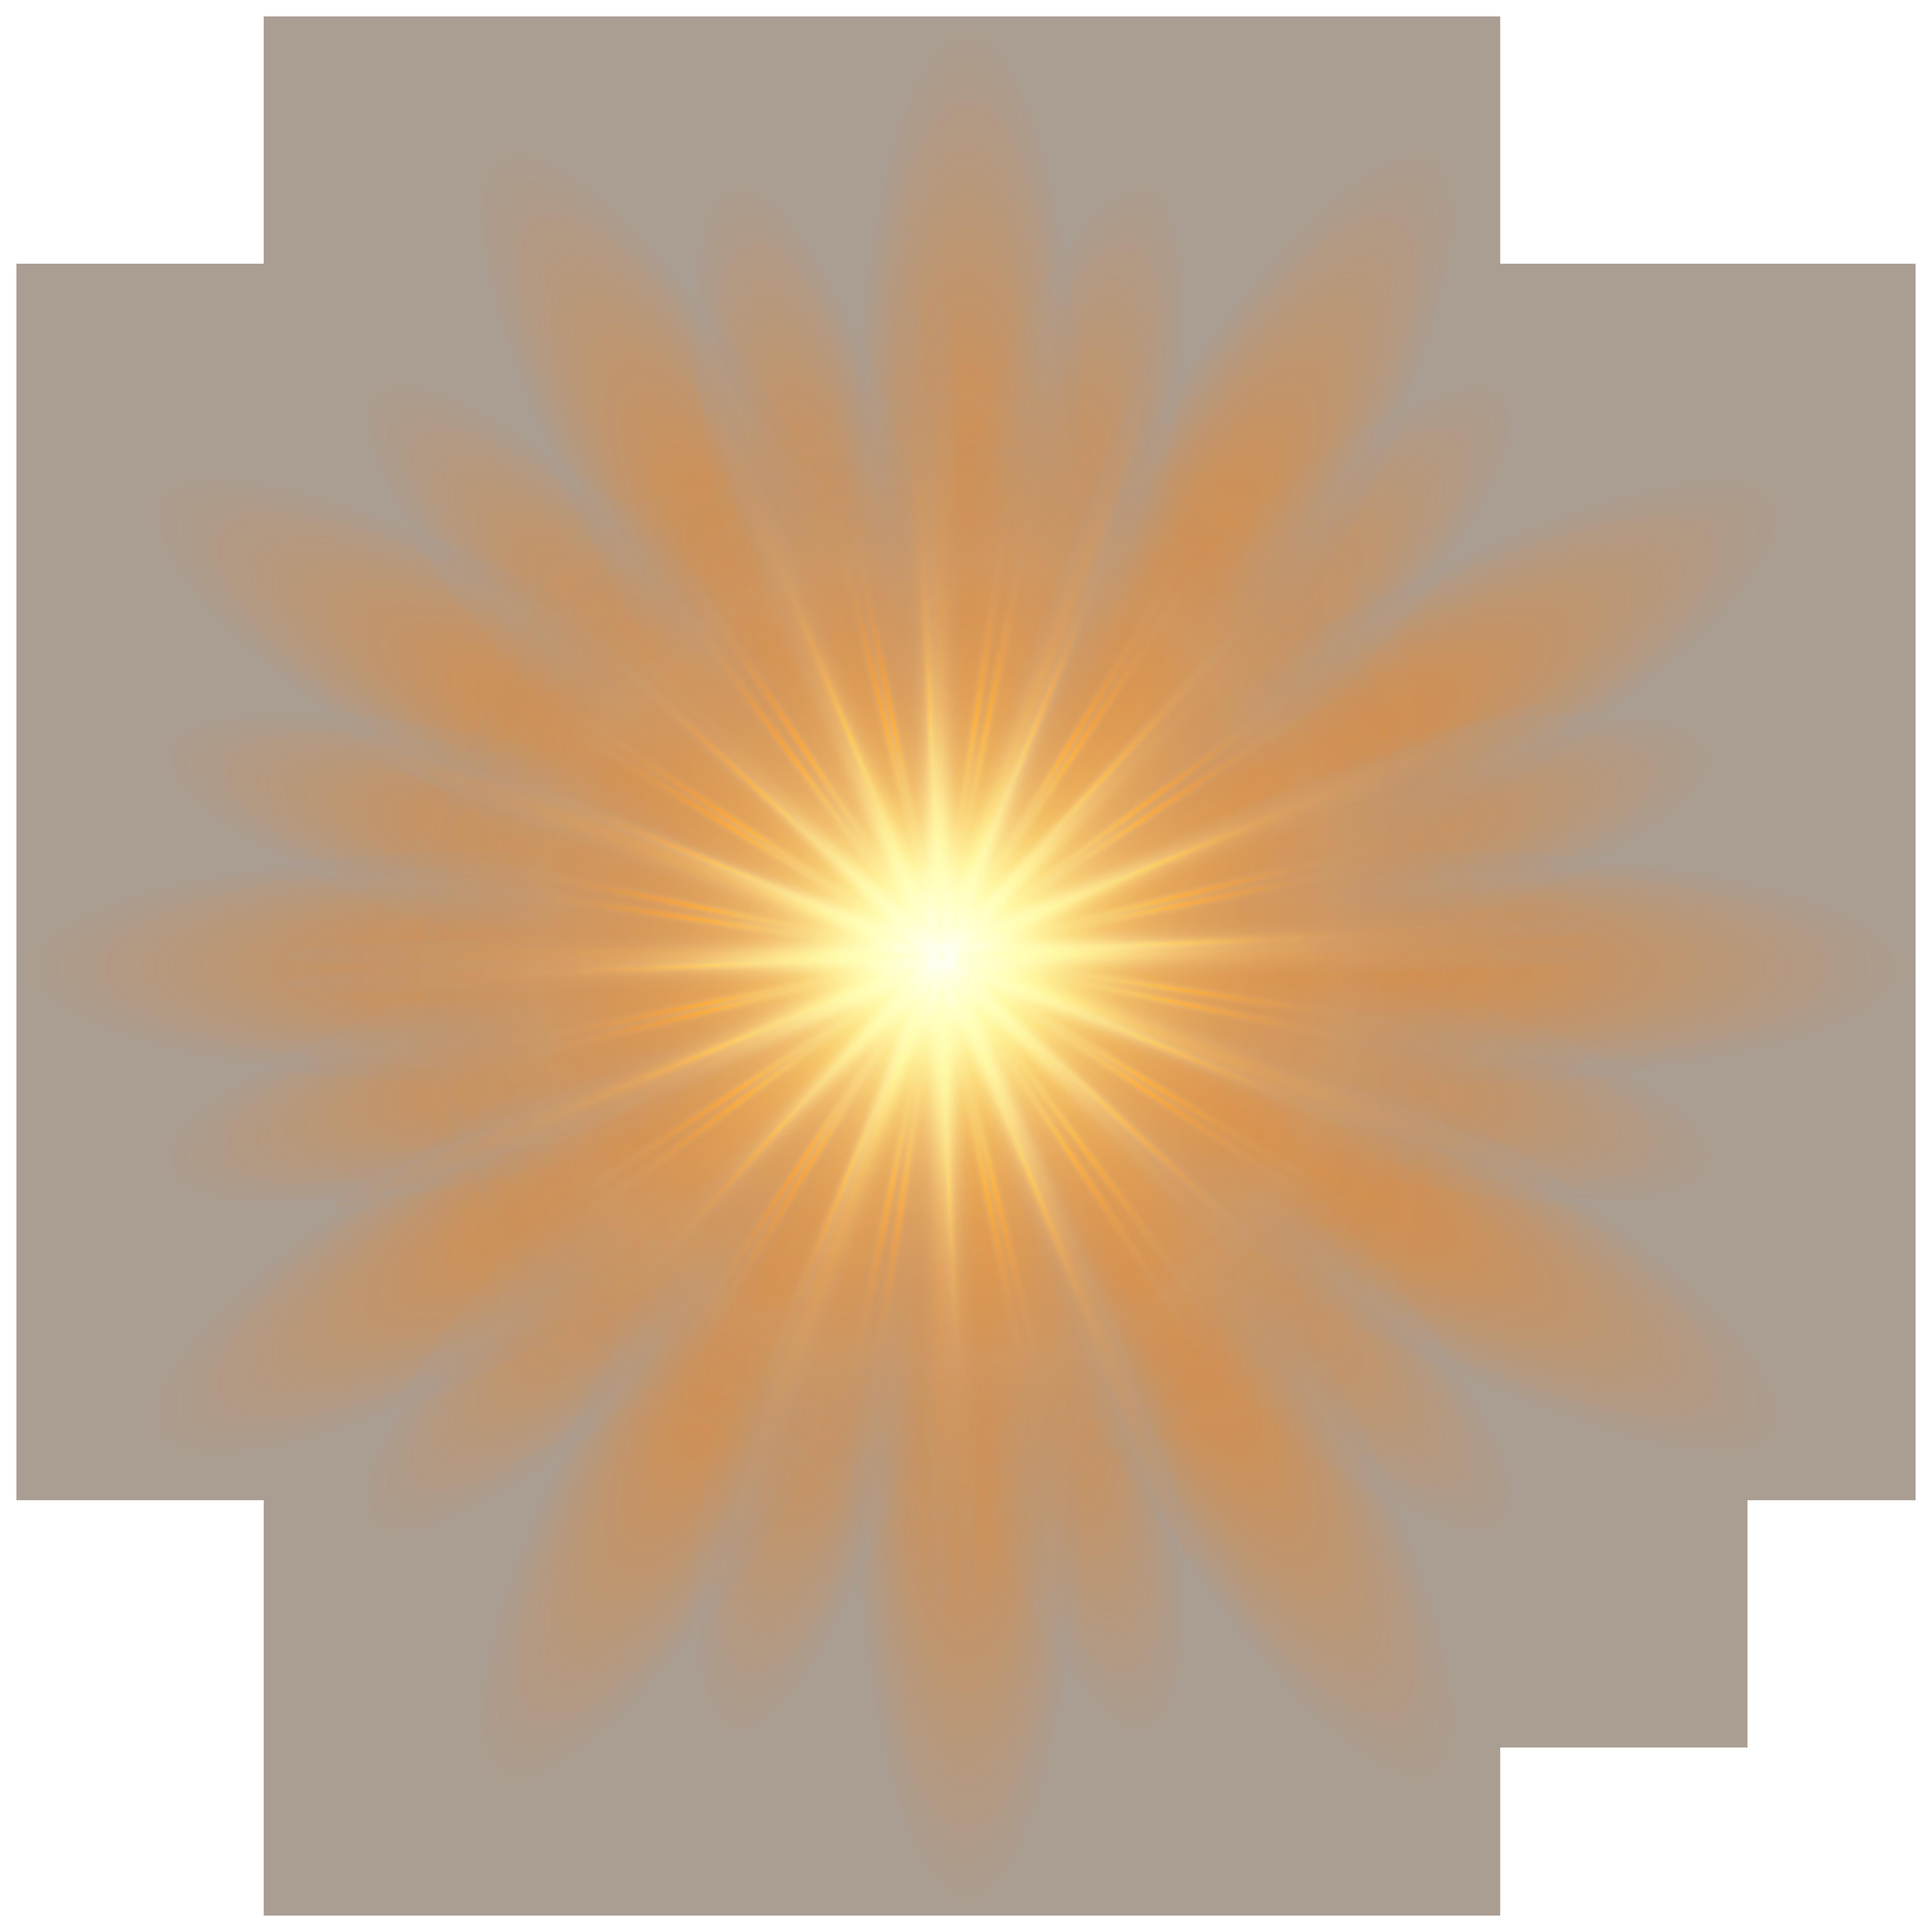 image freeuse stock Light Sun Effect Transparent Clip Art